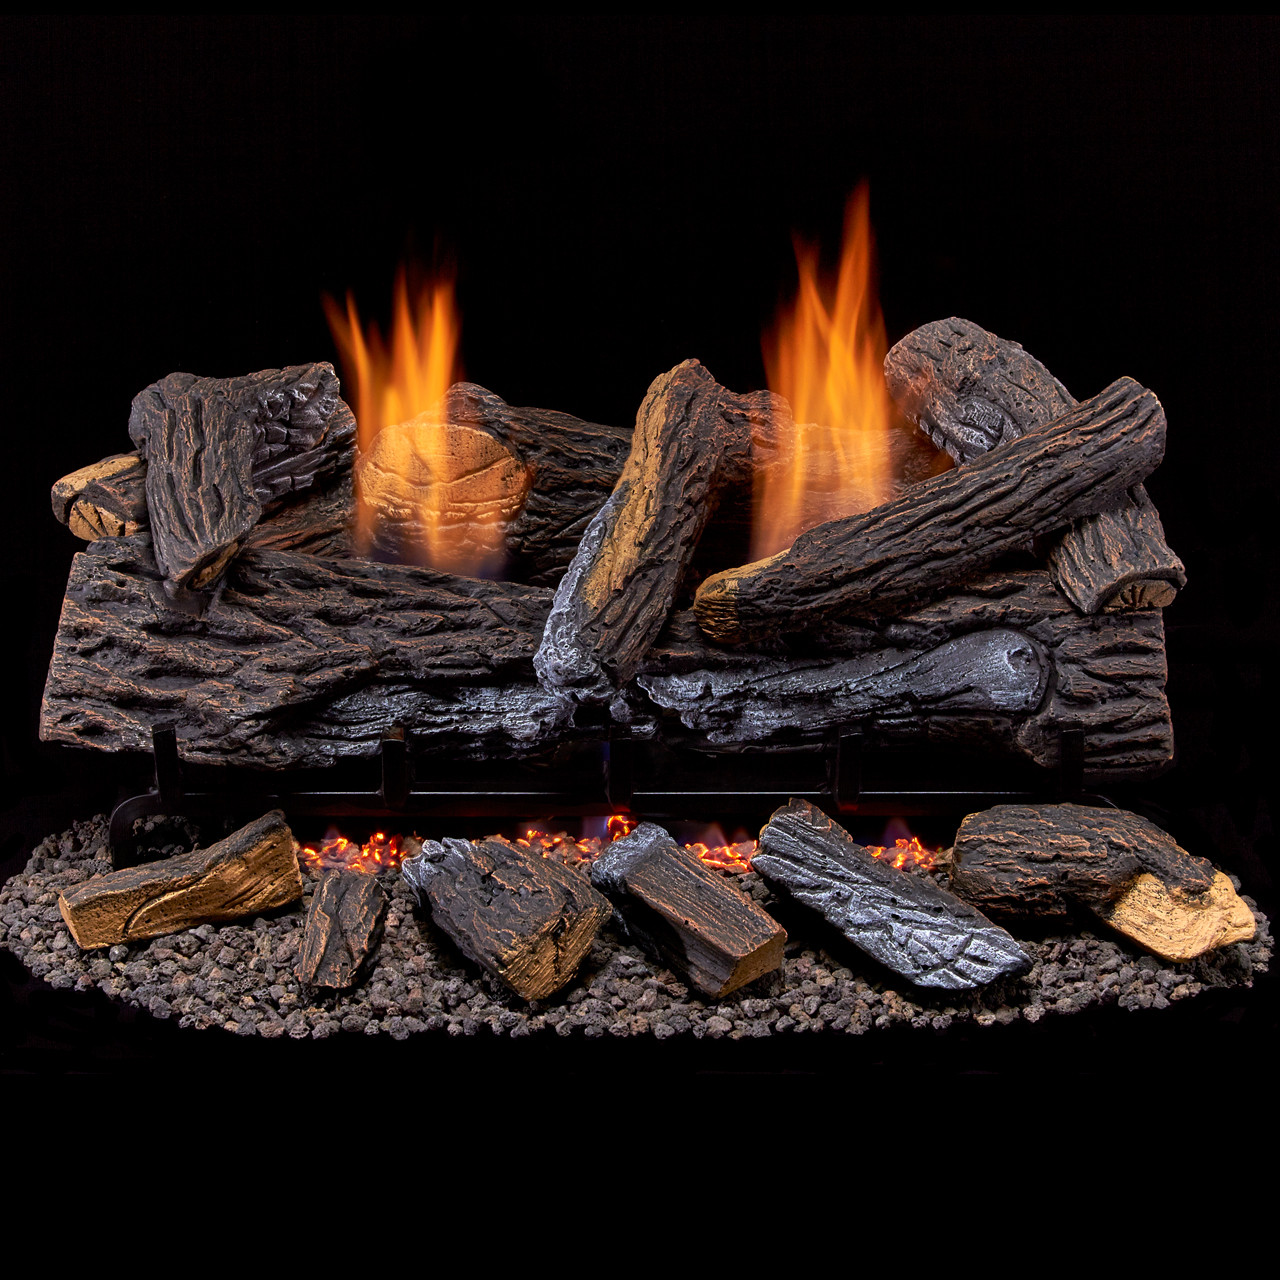 Vented Gas Fireplace Log Set Dual-Burner Heater Decorative Fire Rocks 24 in.